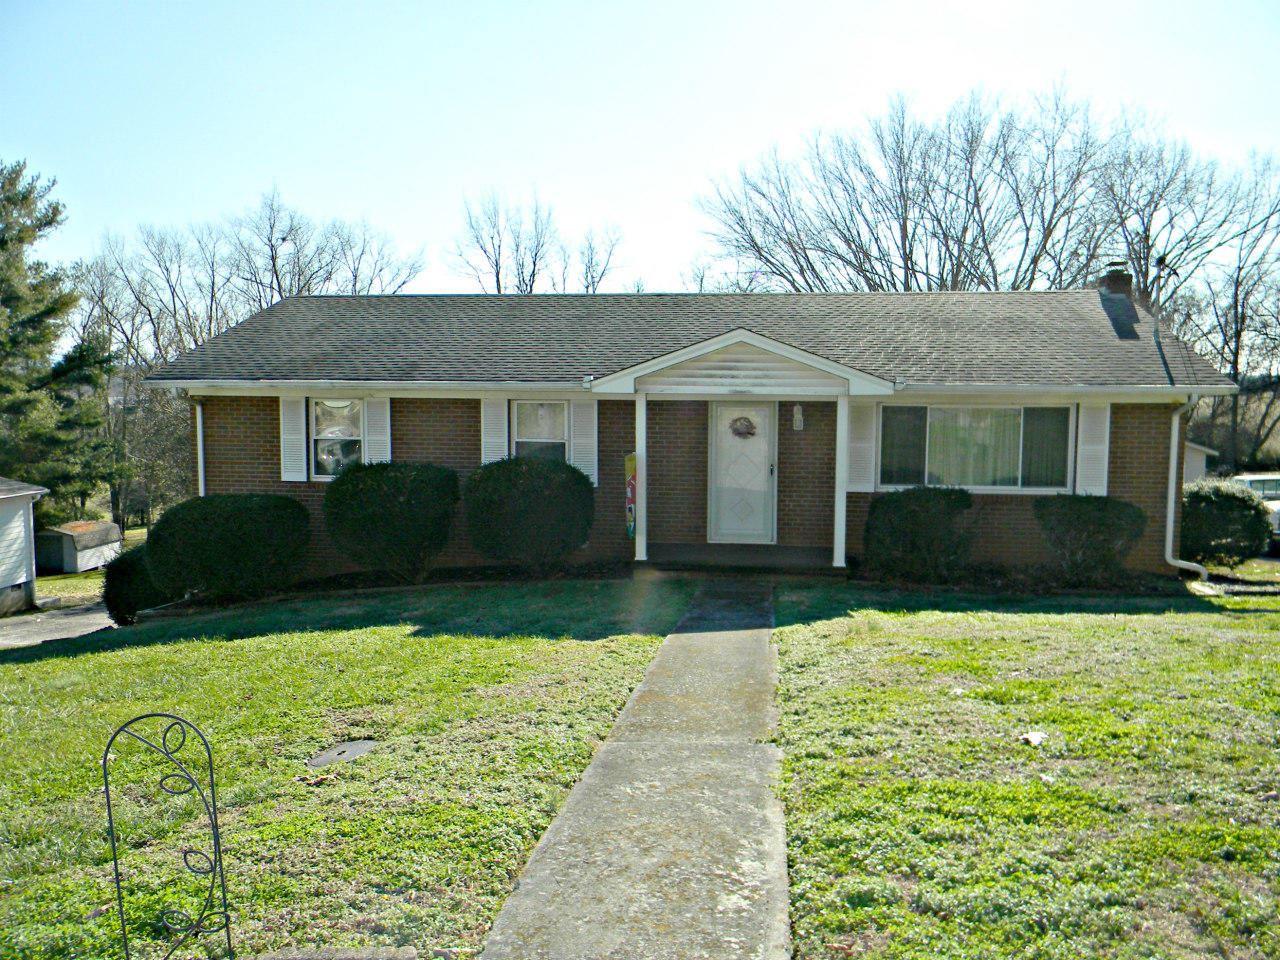 Photo of 351 Summit Heights Drive, Jefferson City, TN 37760 (MLS # 1140308)